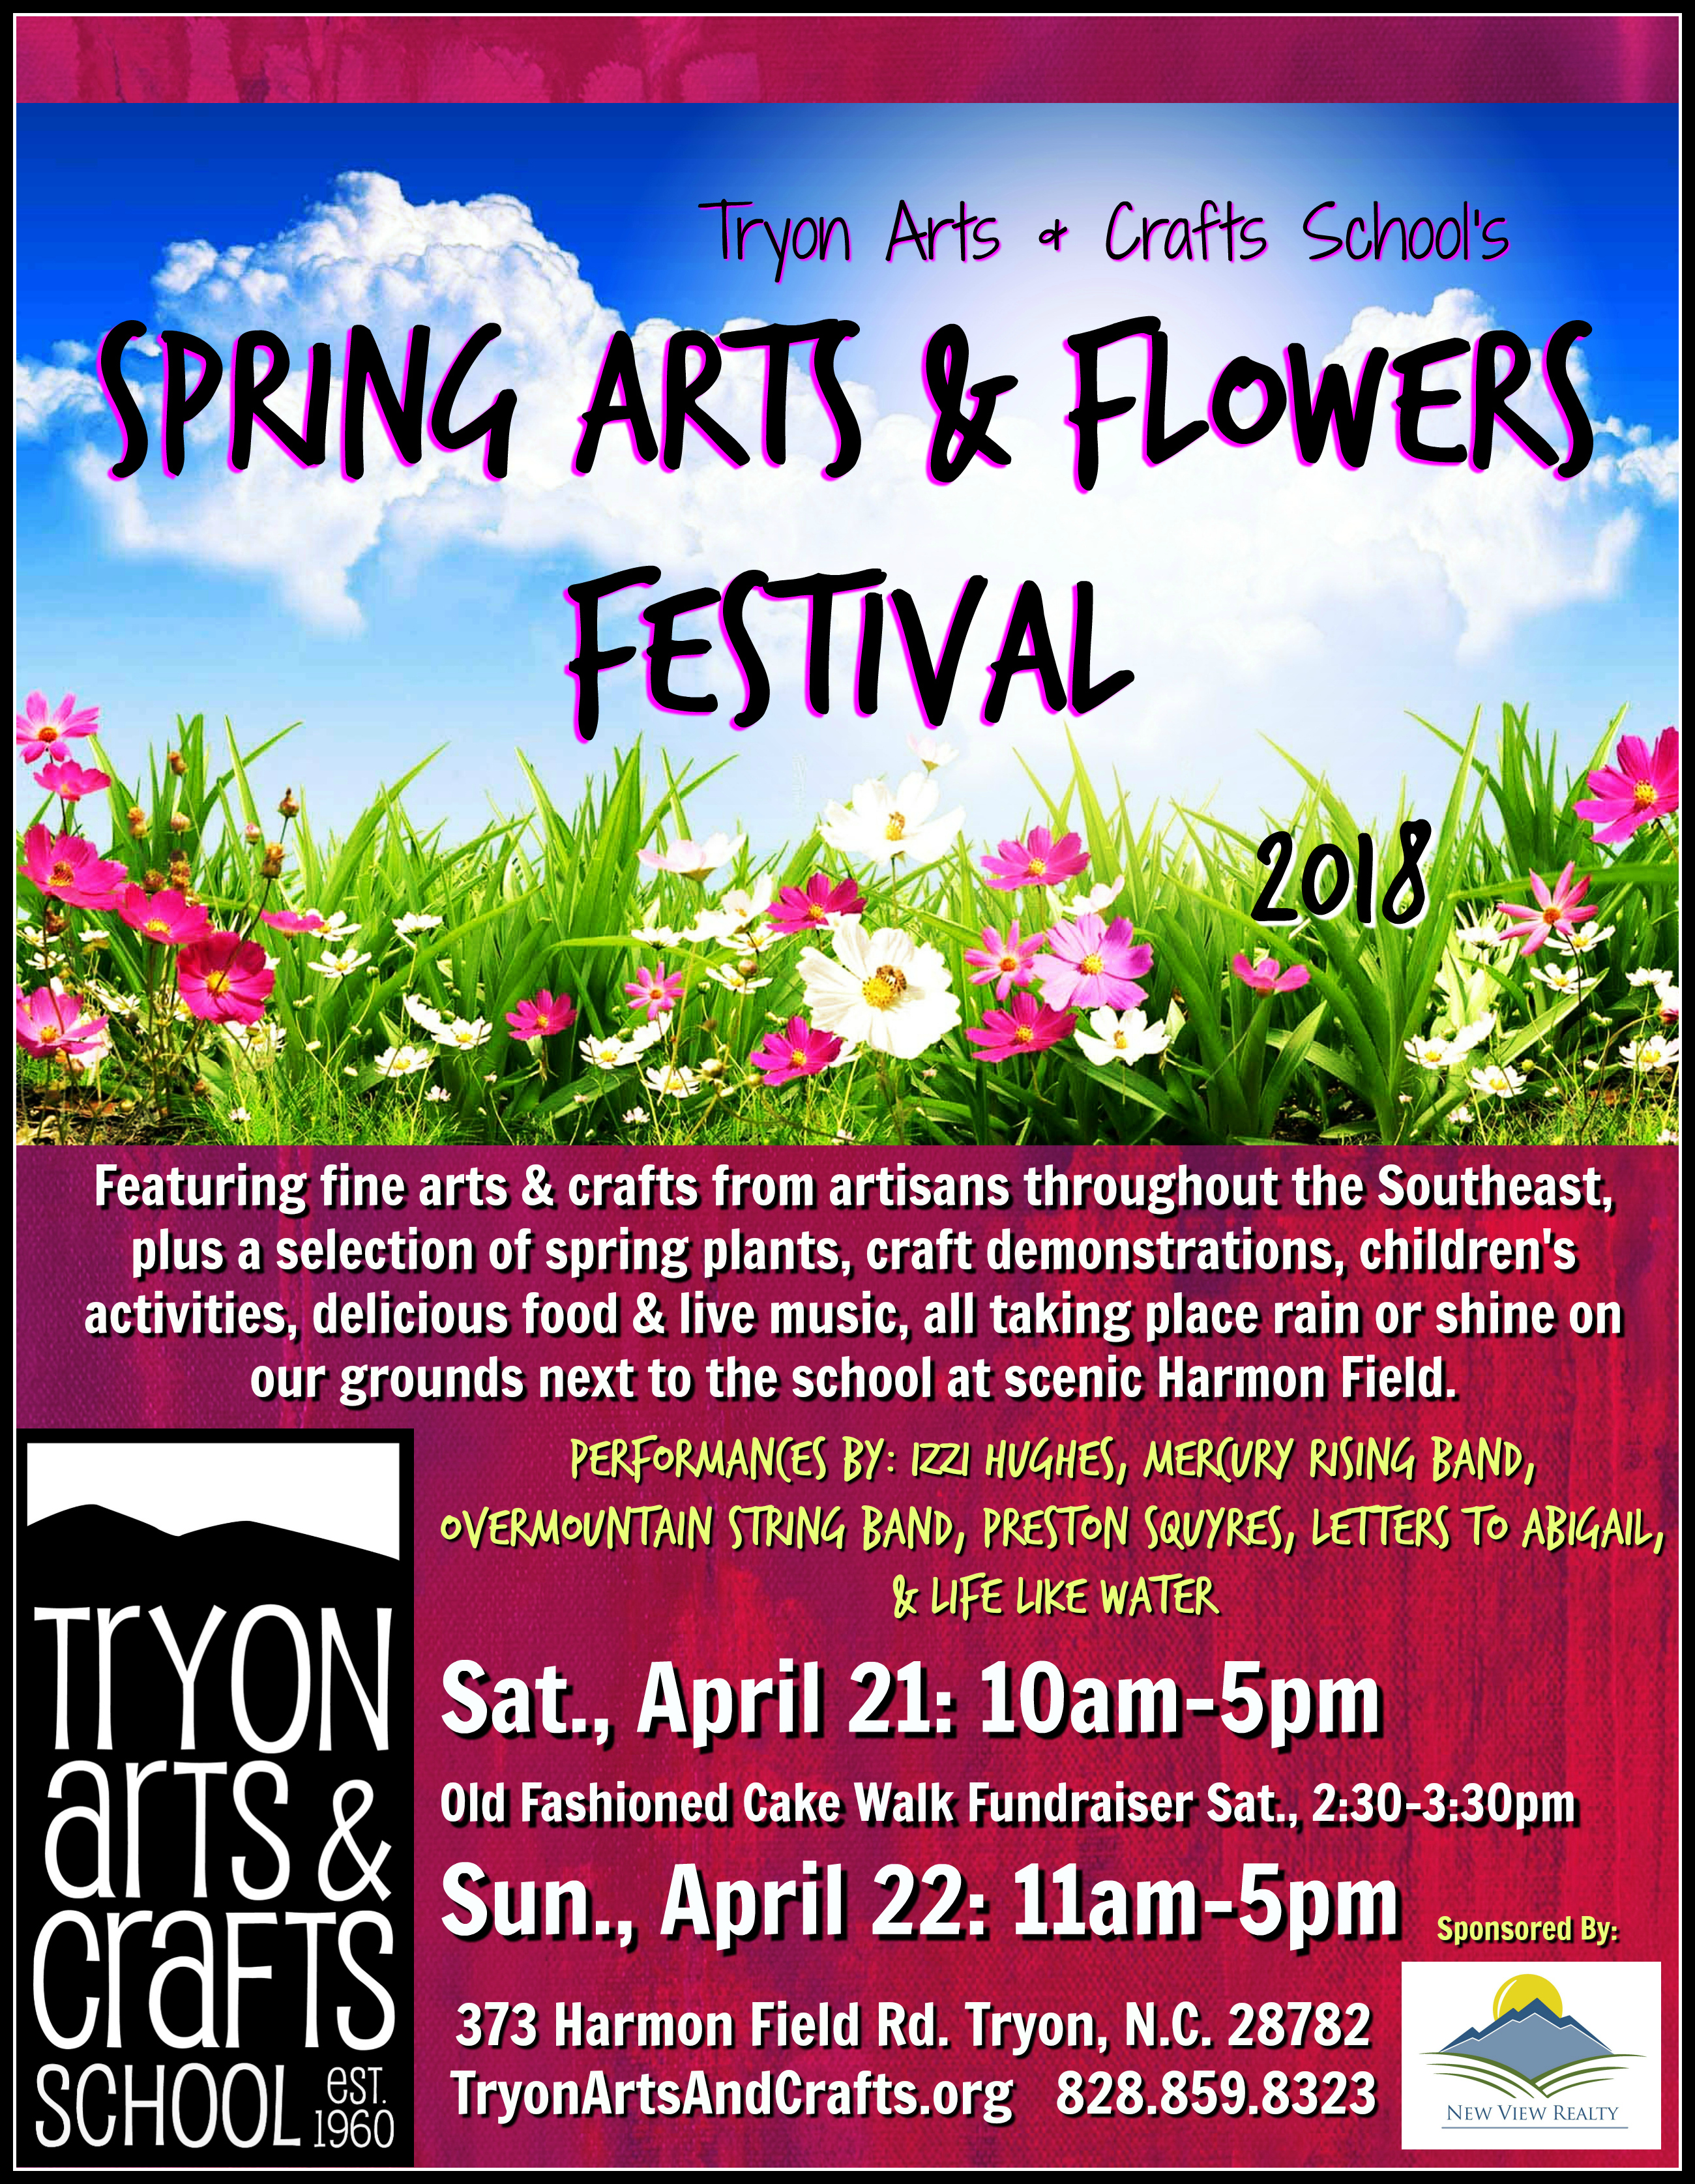 Tryon Arts Crafts School S Spring Arts Flowers Festival Wtzq